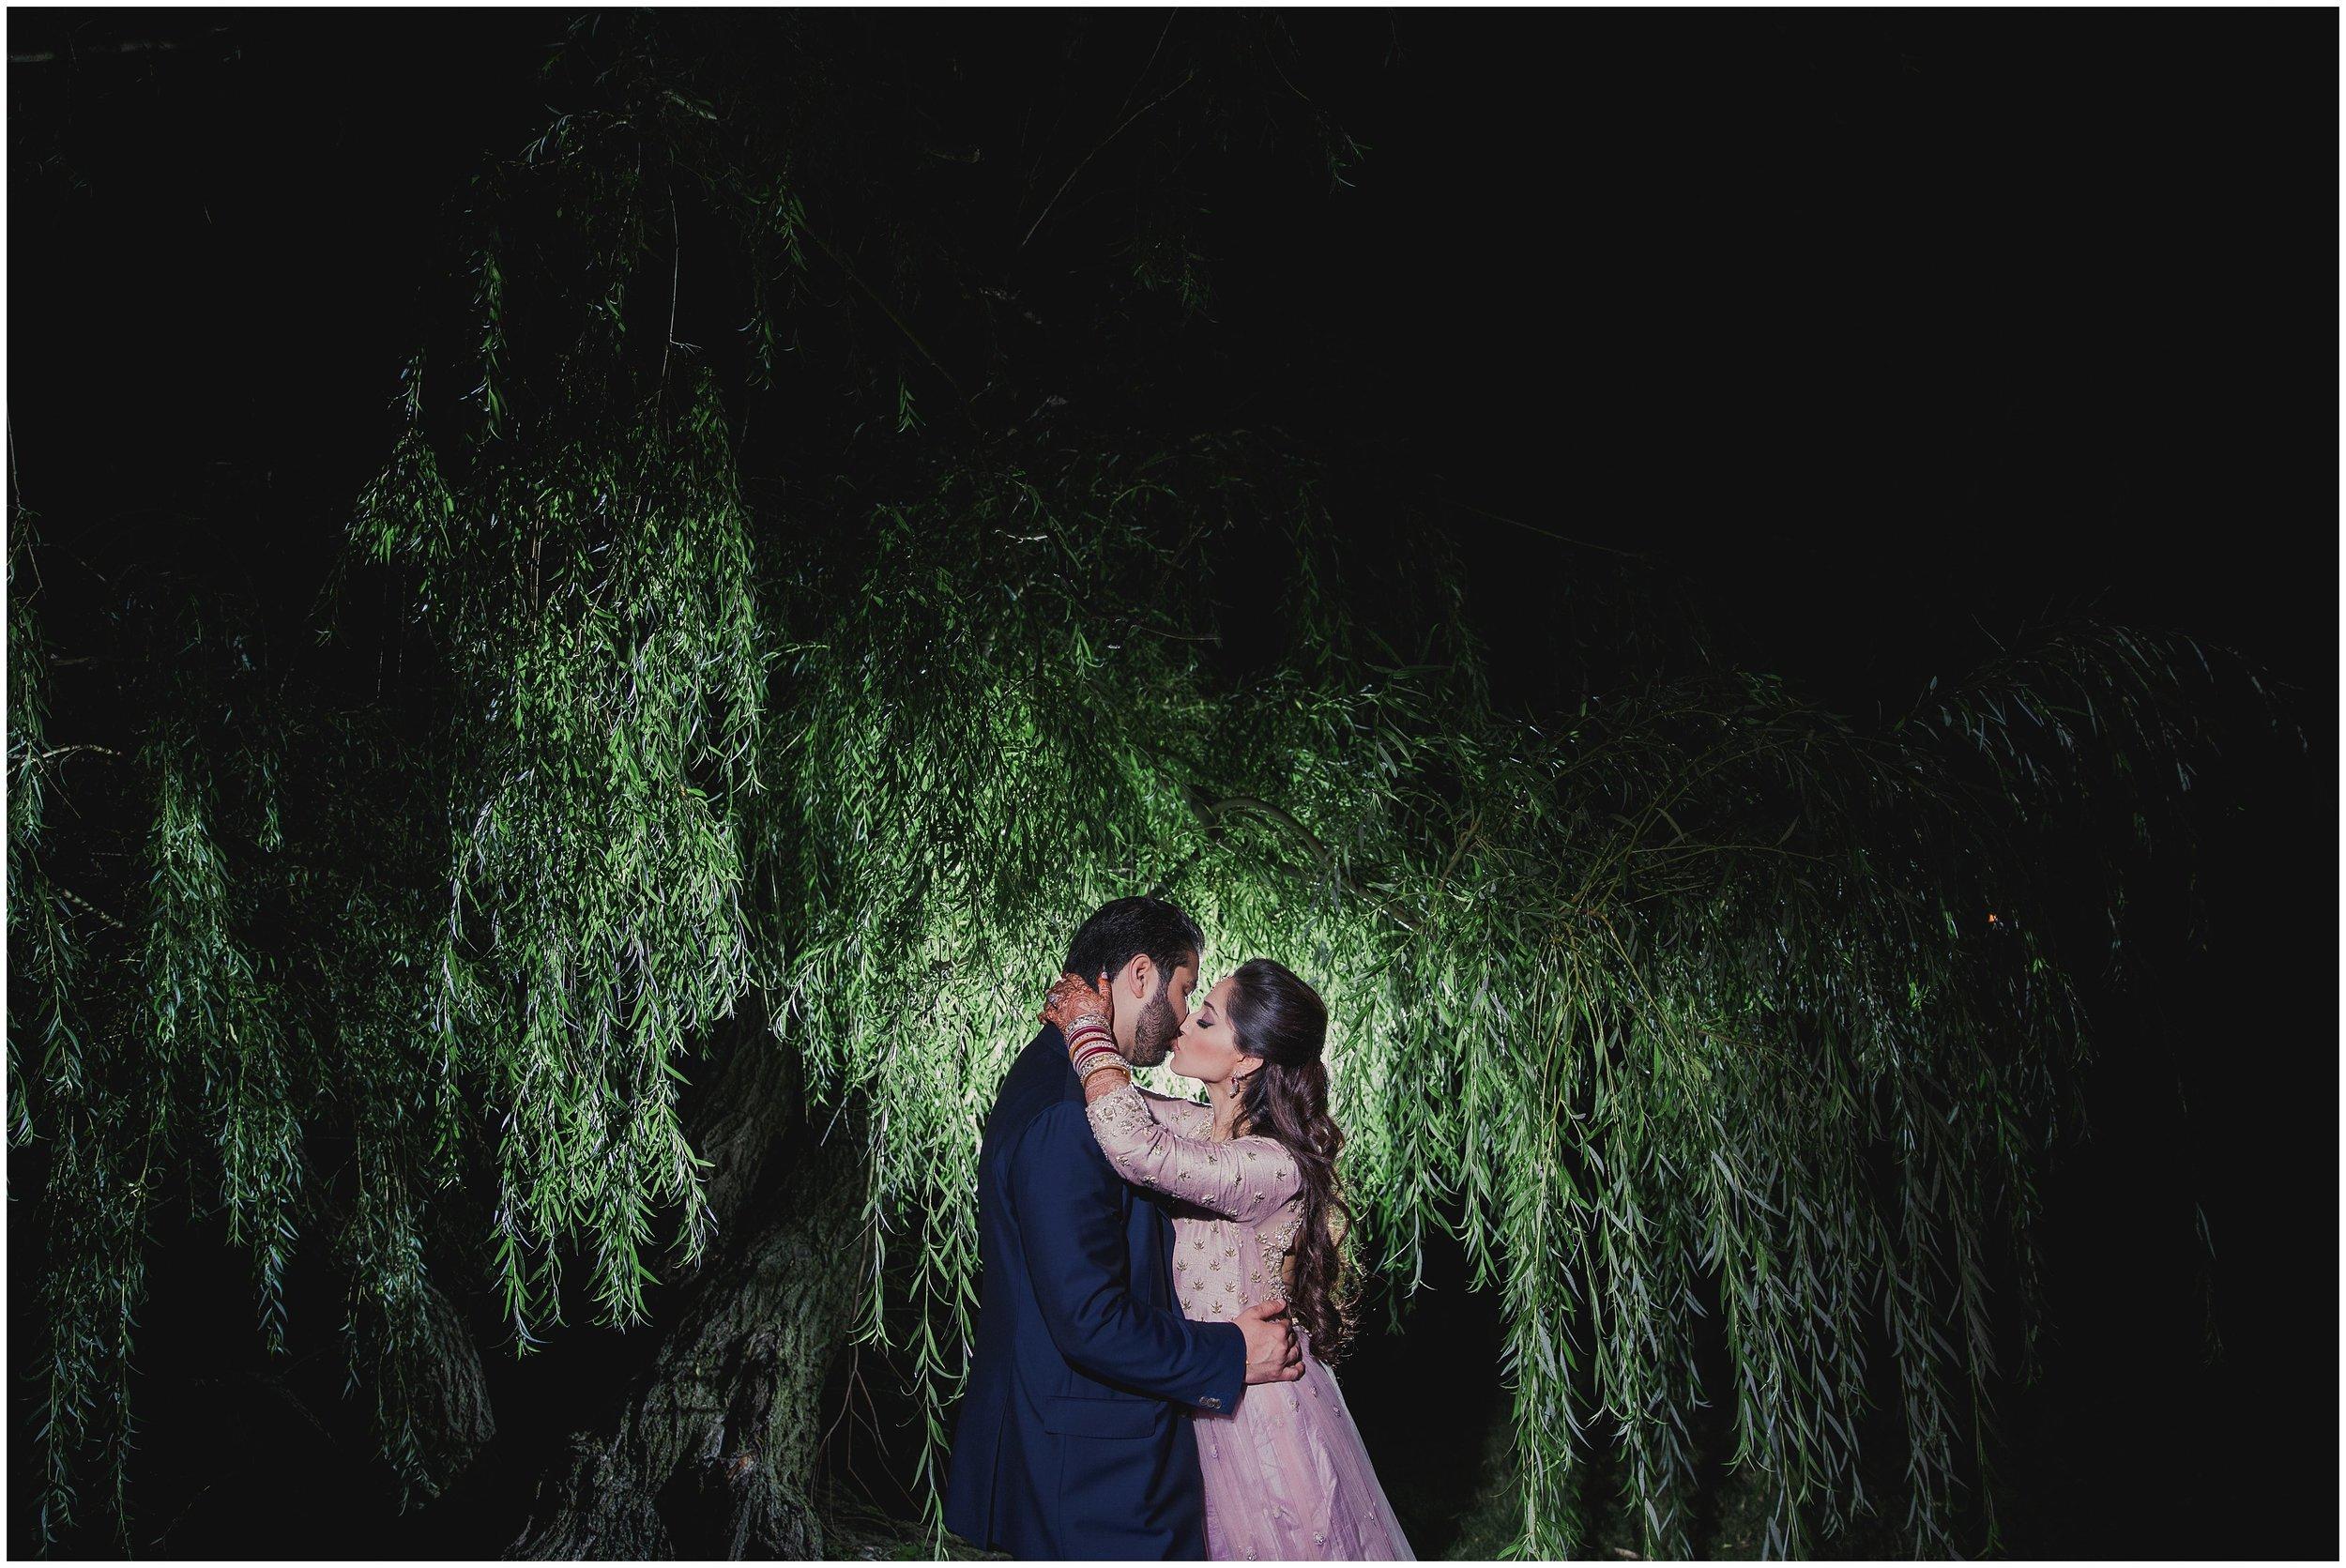 Le Cape Weddings - South Asian Wedding in Illinois - Tanvi and Anshul -3001_LuxuryDestinationPhotographer.jpg